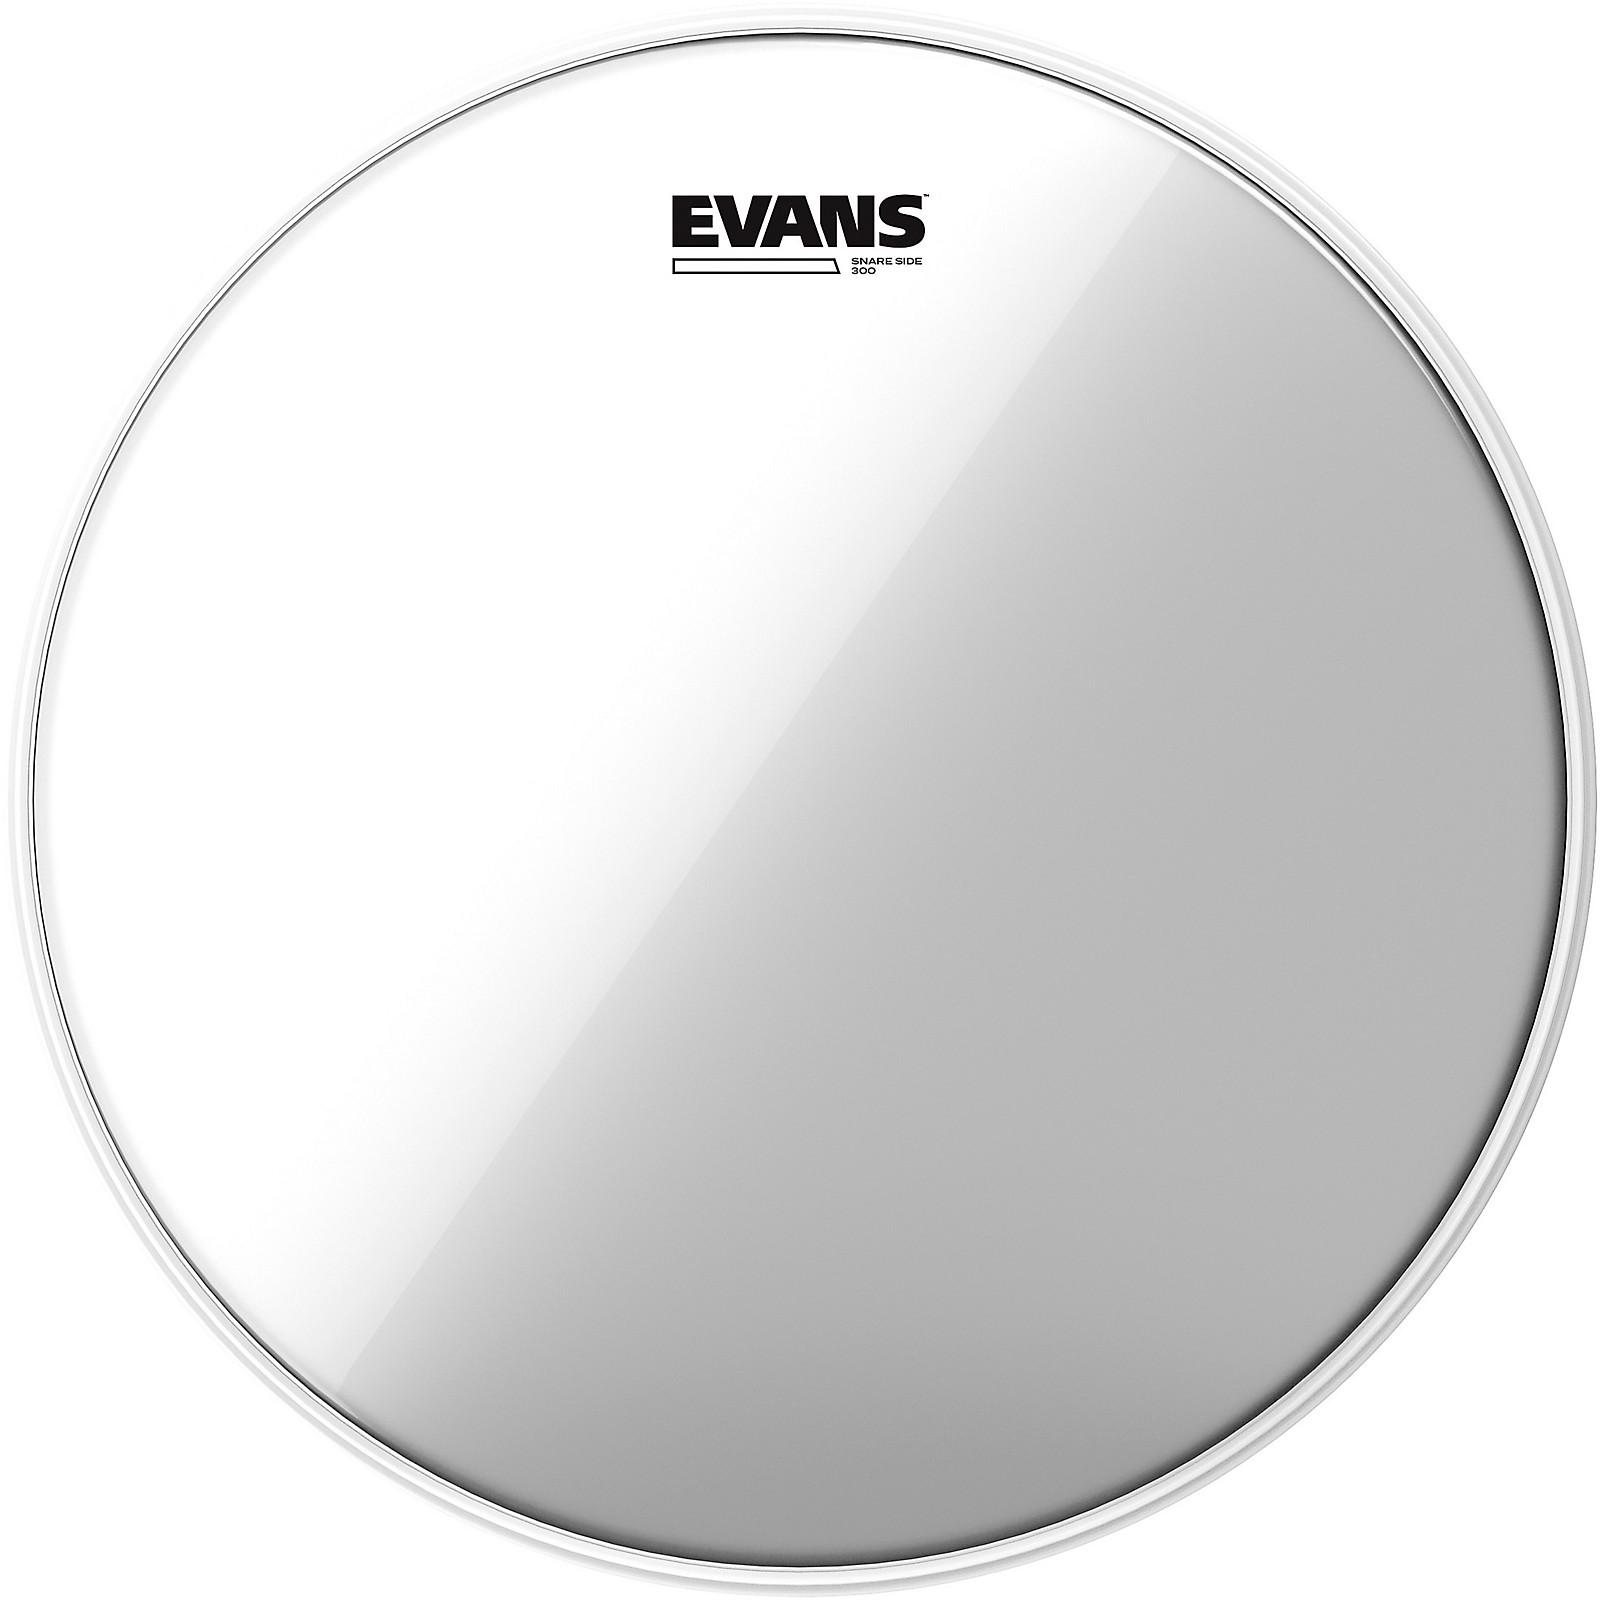 Evans 300 Snare Side Drum Head